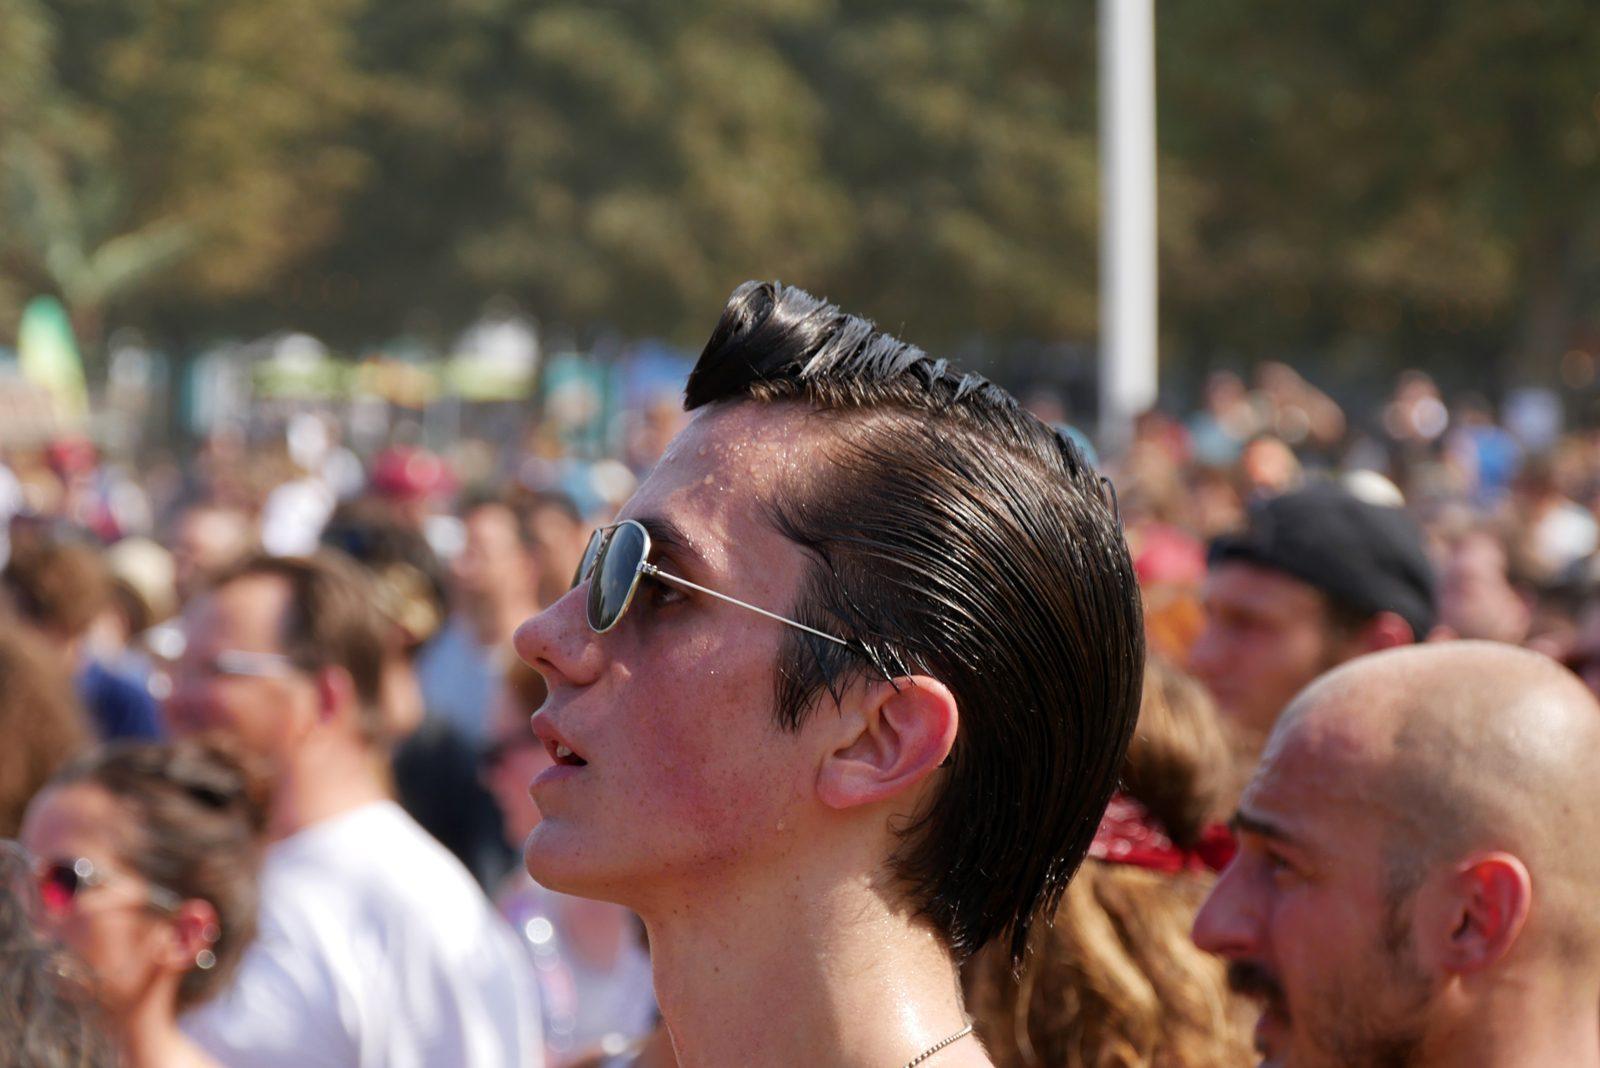 Rock en Seine 2016 festivalier gominé en sueur festival photo usofparis blog